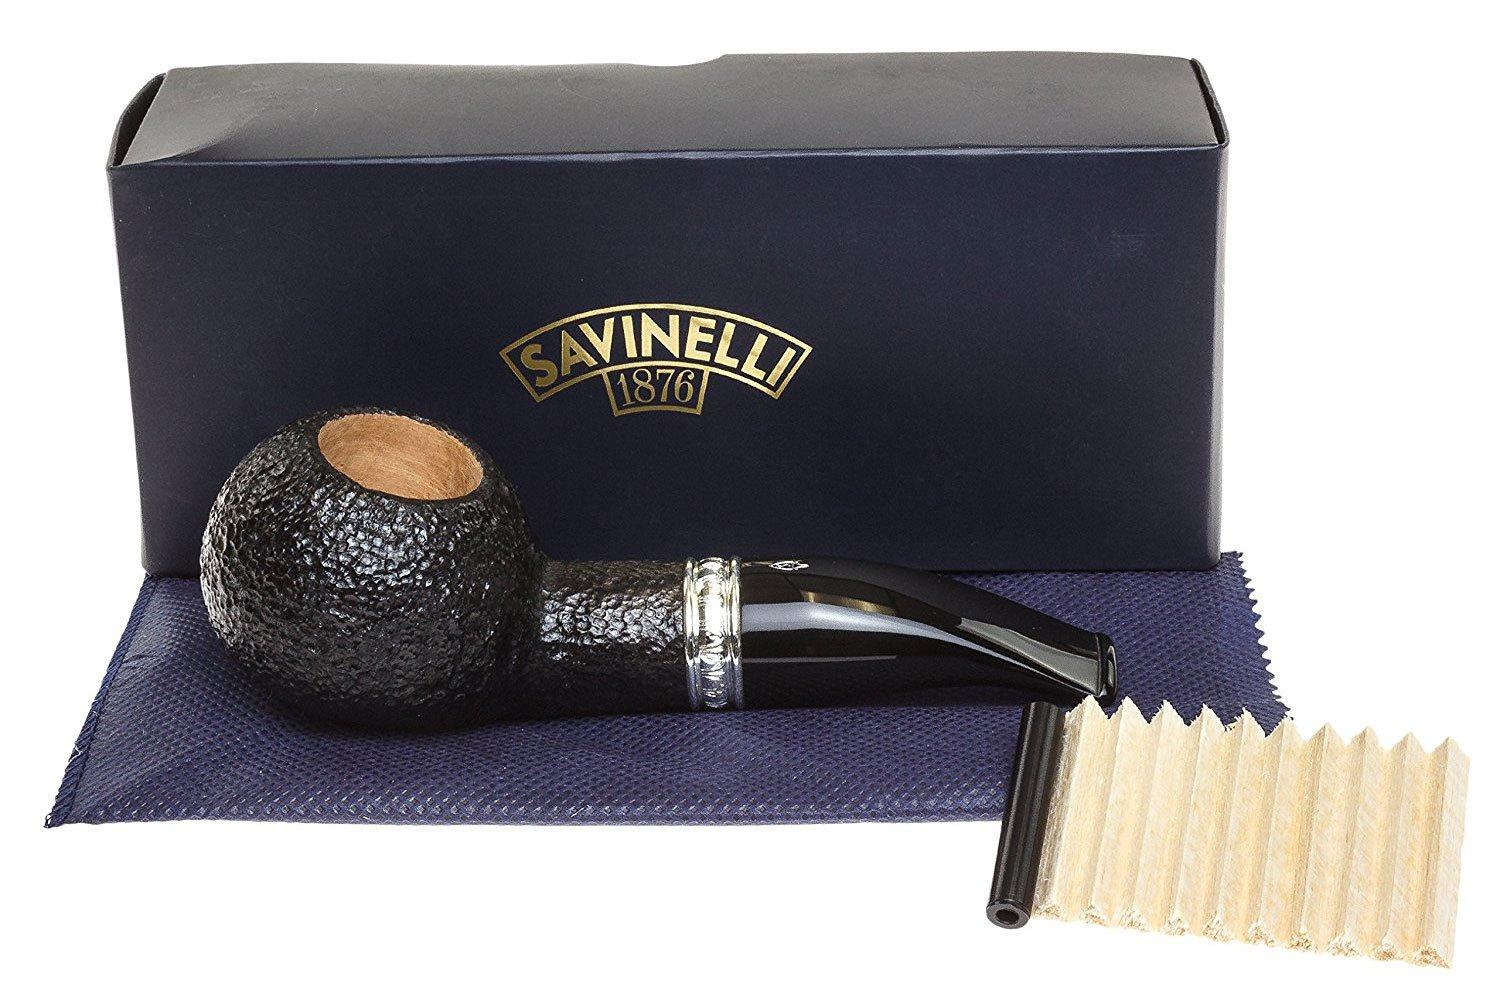 Savinelli Italian Tobacco Smoking Pipes, Trevi Rusticated 320 KS by Savinelli